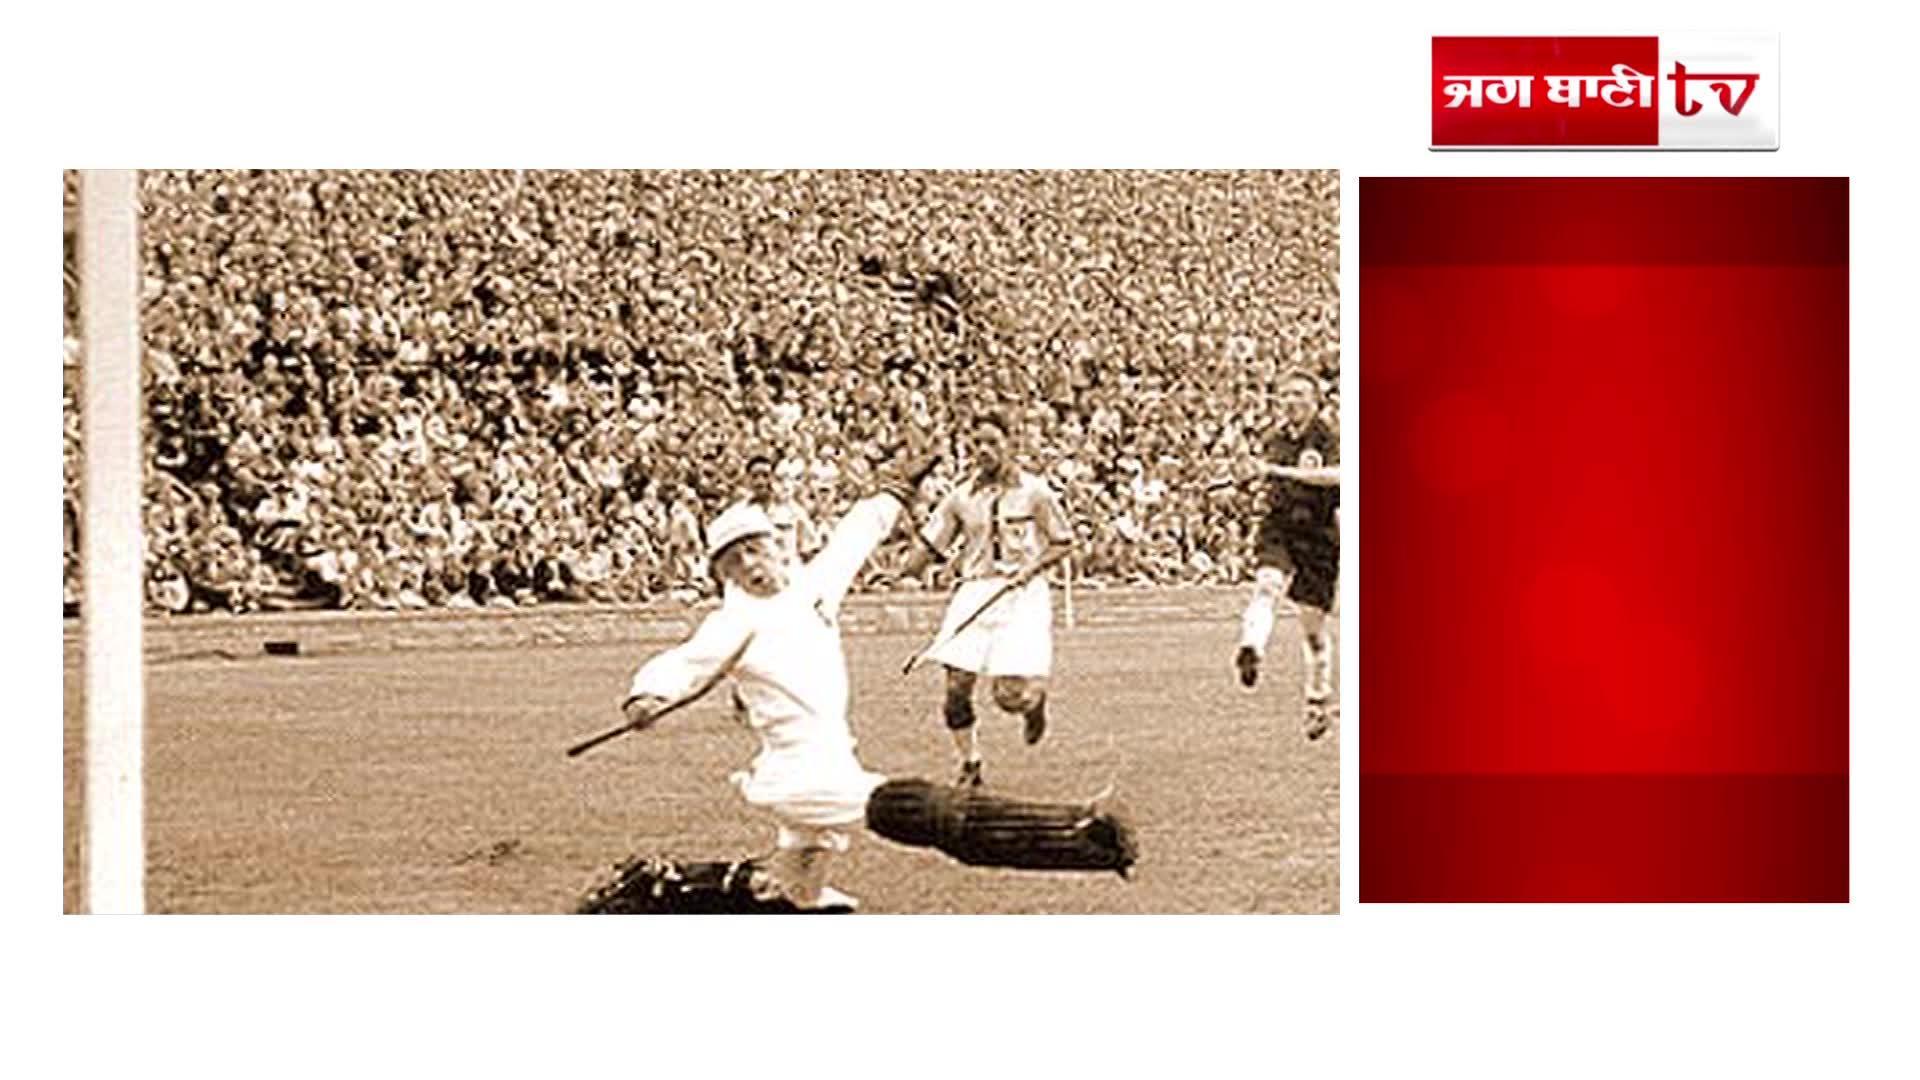 Image of ਮਹਾਨ ਹਾਕੀ ਖਿਡਾਰੀ ਮੇਜਰ ਧਿਆਨ ਚੰਦ ਨੂੰ ਯਾਦ ਕਰਦਿਆਂ